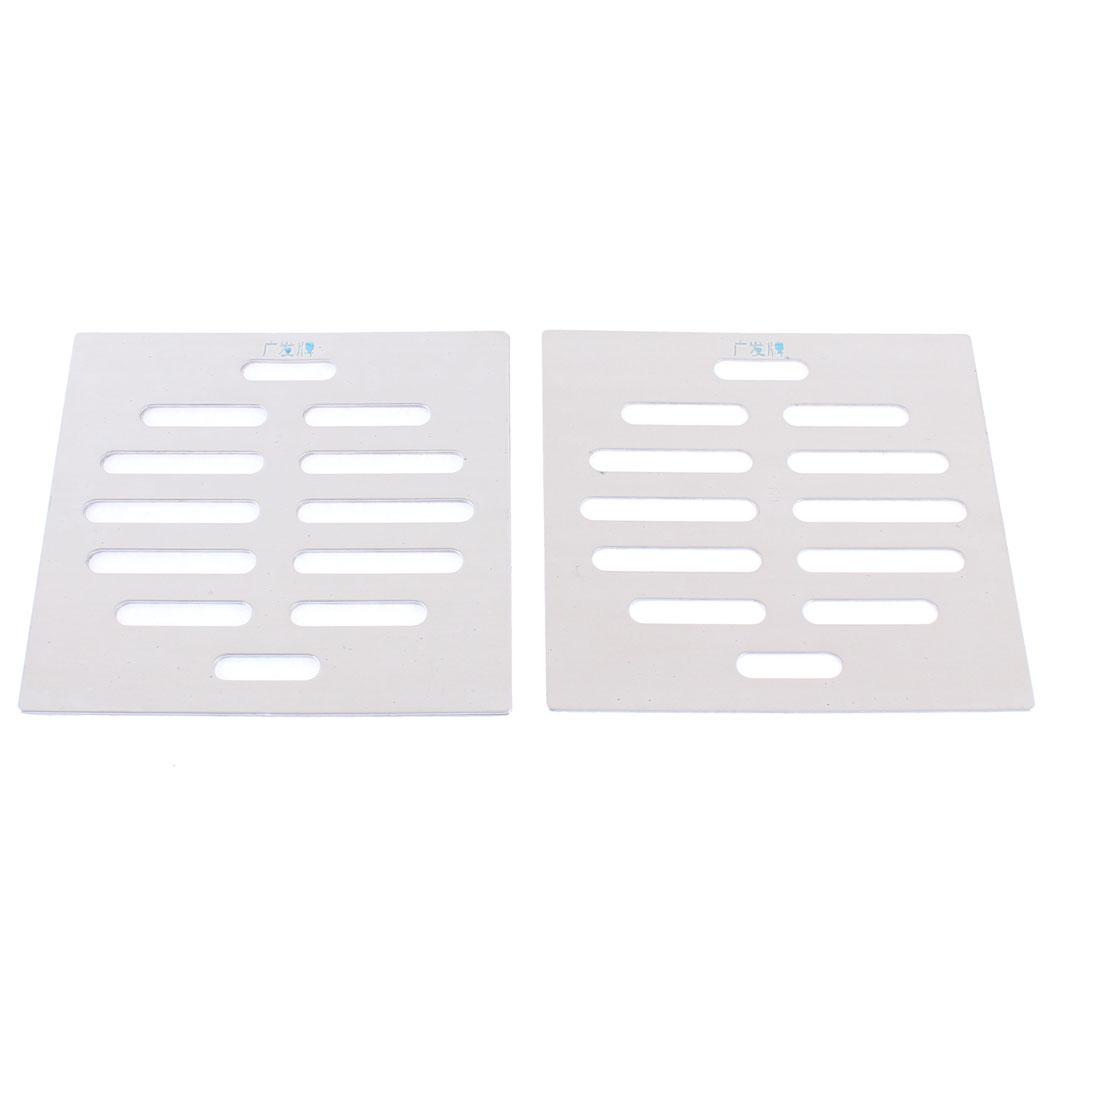 "Stainless Steel Kitchen Bathroom Square Floor Drain Cover 4"" 10cm 2pcs"